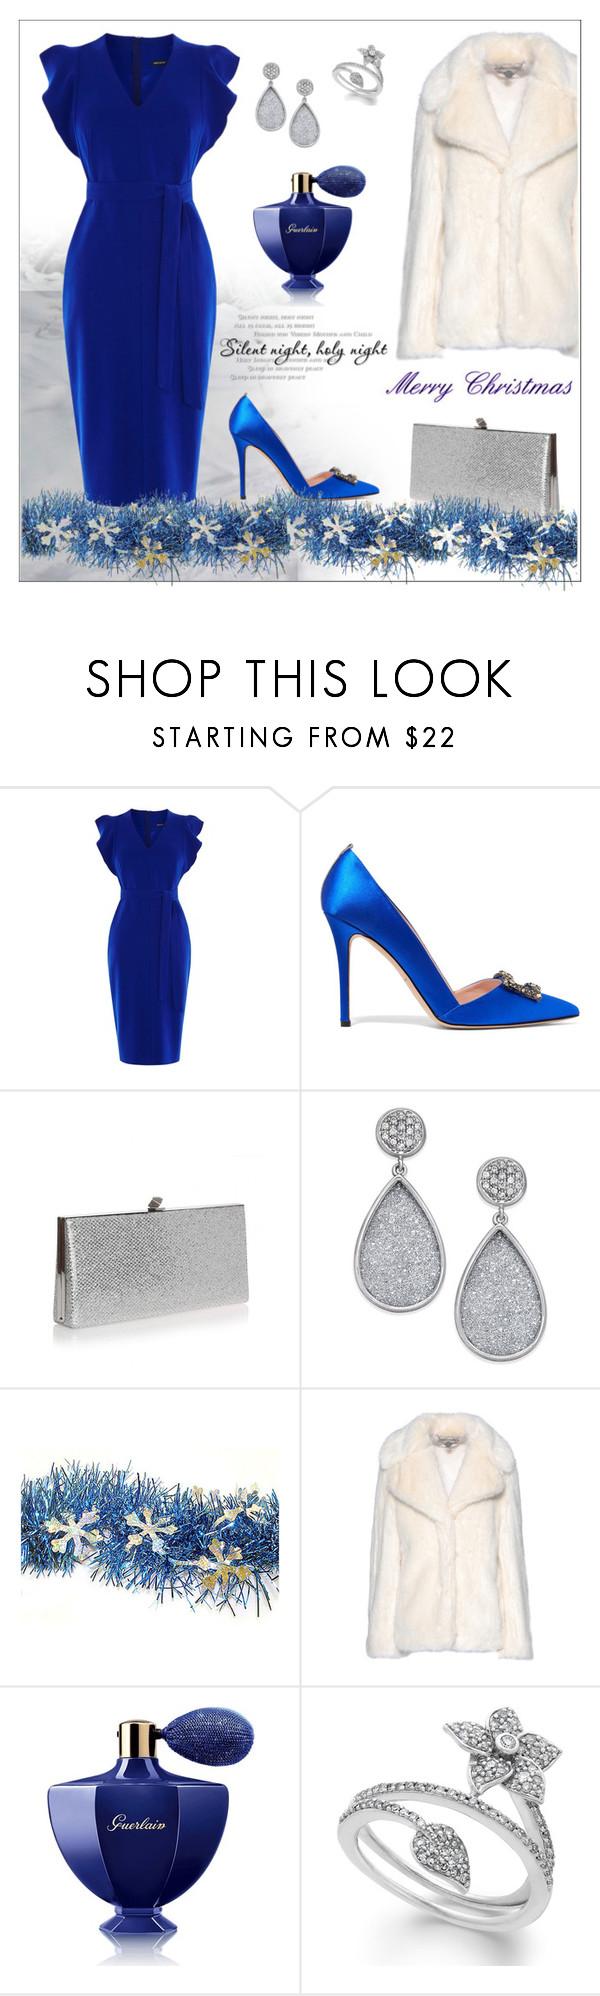 """BLUE DRESS!!!"" by kskafida ❤ liked on Polyvore featuring Karen Millen, SJP, Jimmy Choo, STELLA McCARTNEY and Guerlain"